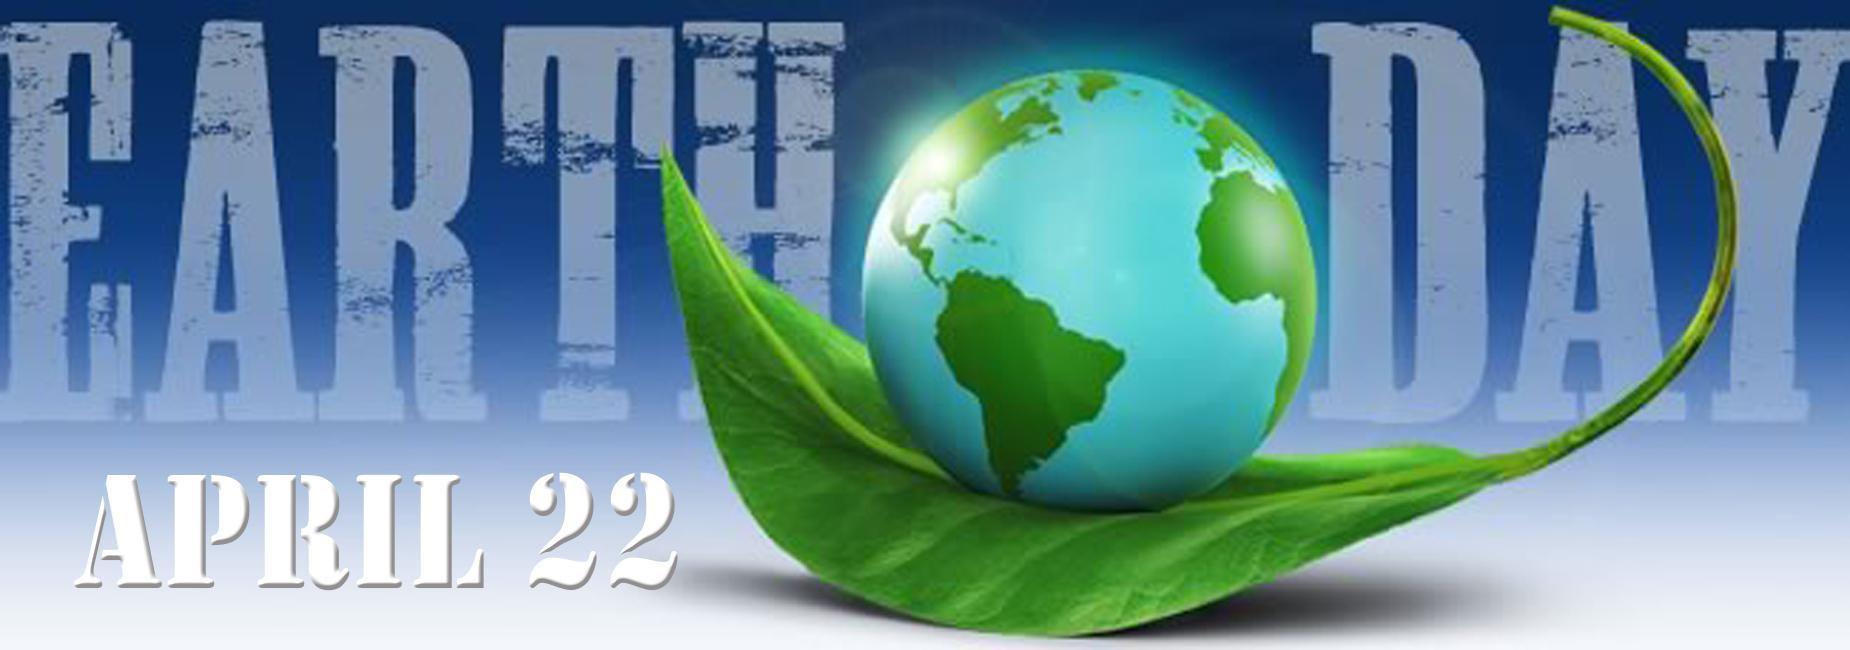 Earth Day Aprill 22